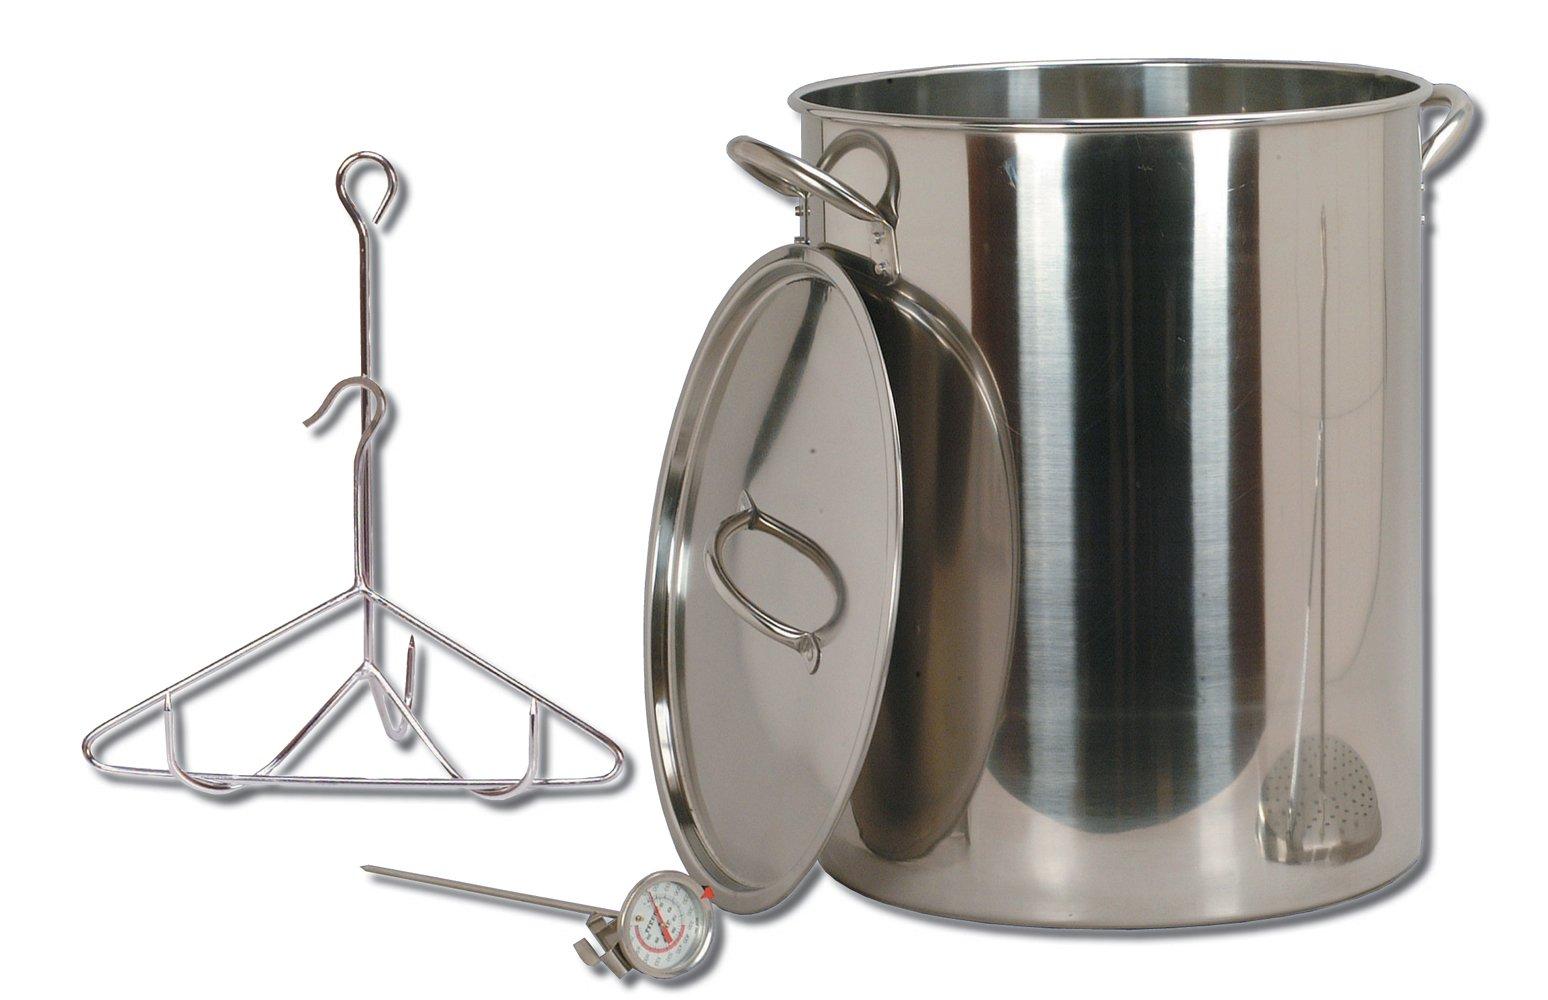 King Kooker 30-Quart Stainless Steel Turkey Pot Package